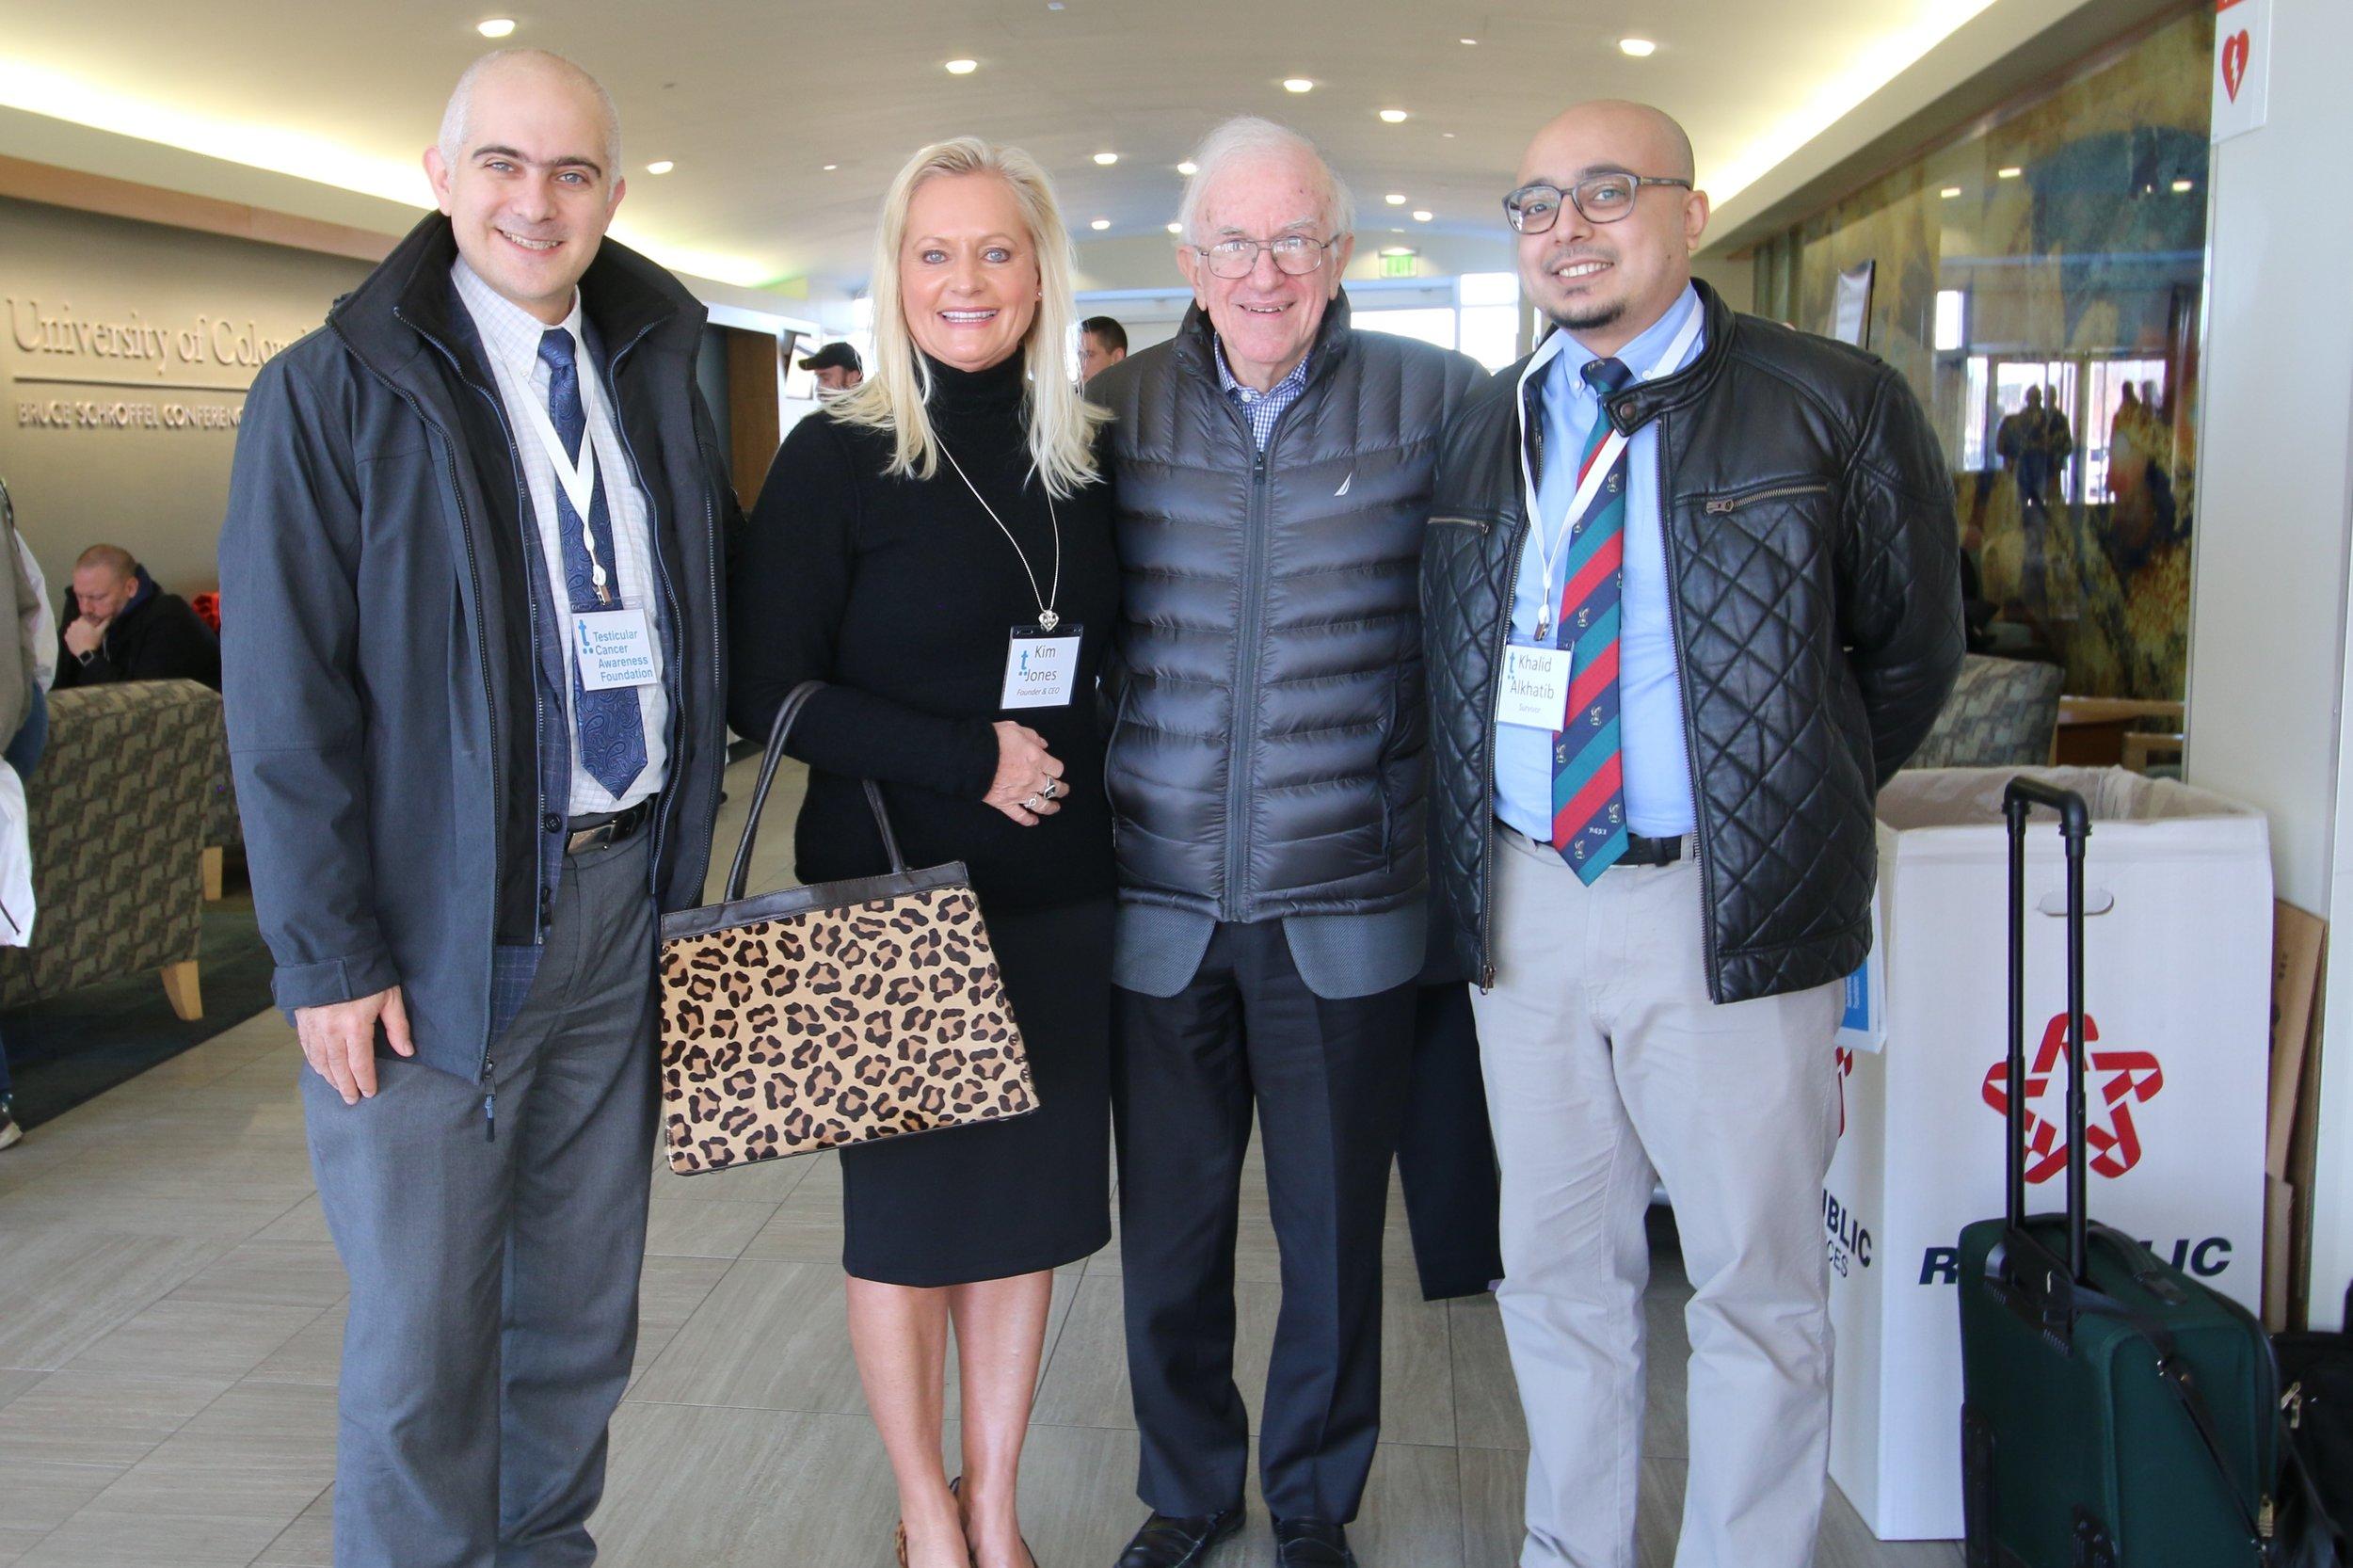 Dr. Albany, Kim, Dr. Einhorn, & Khalid.JPG